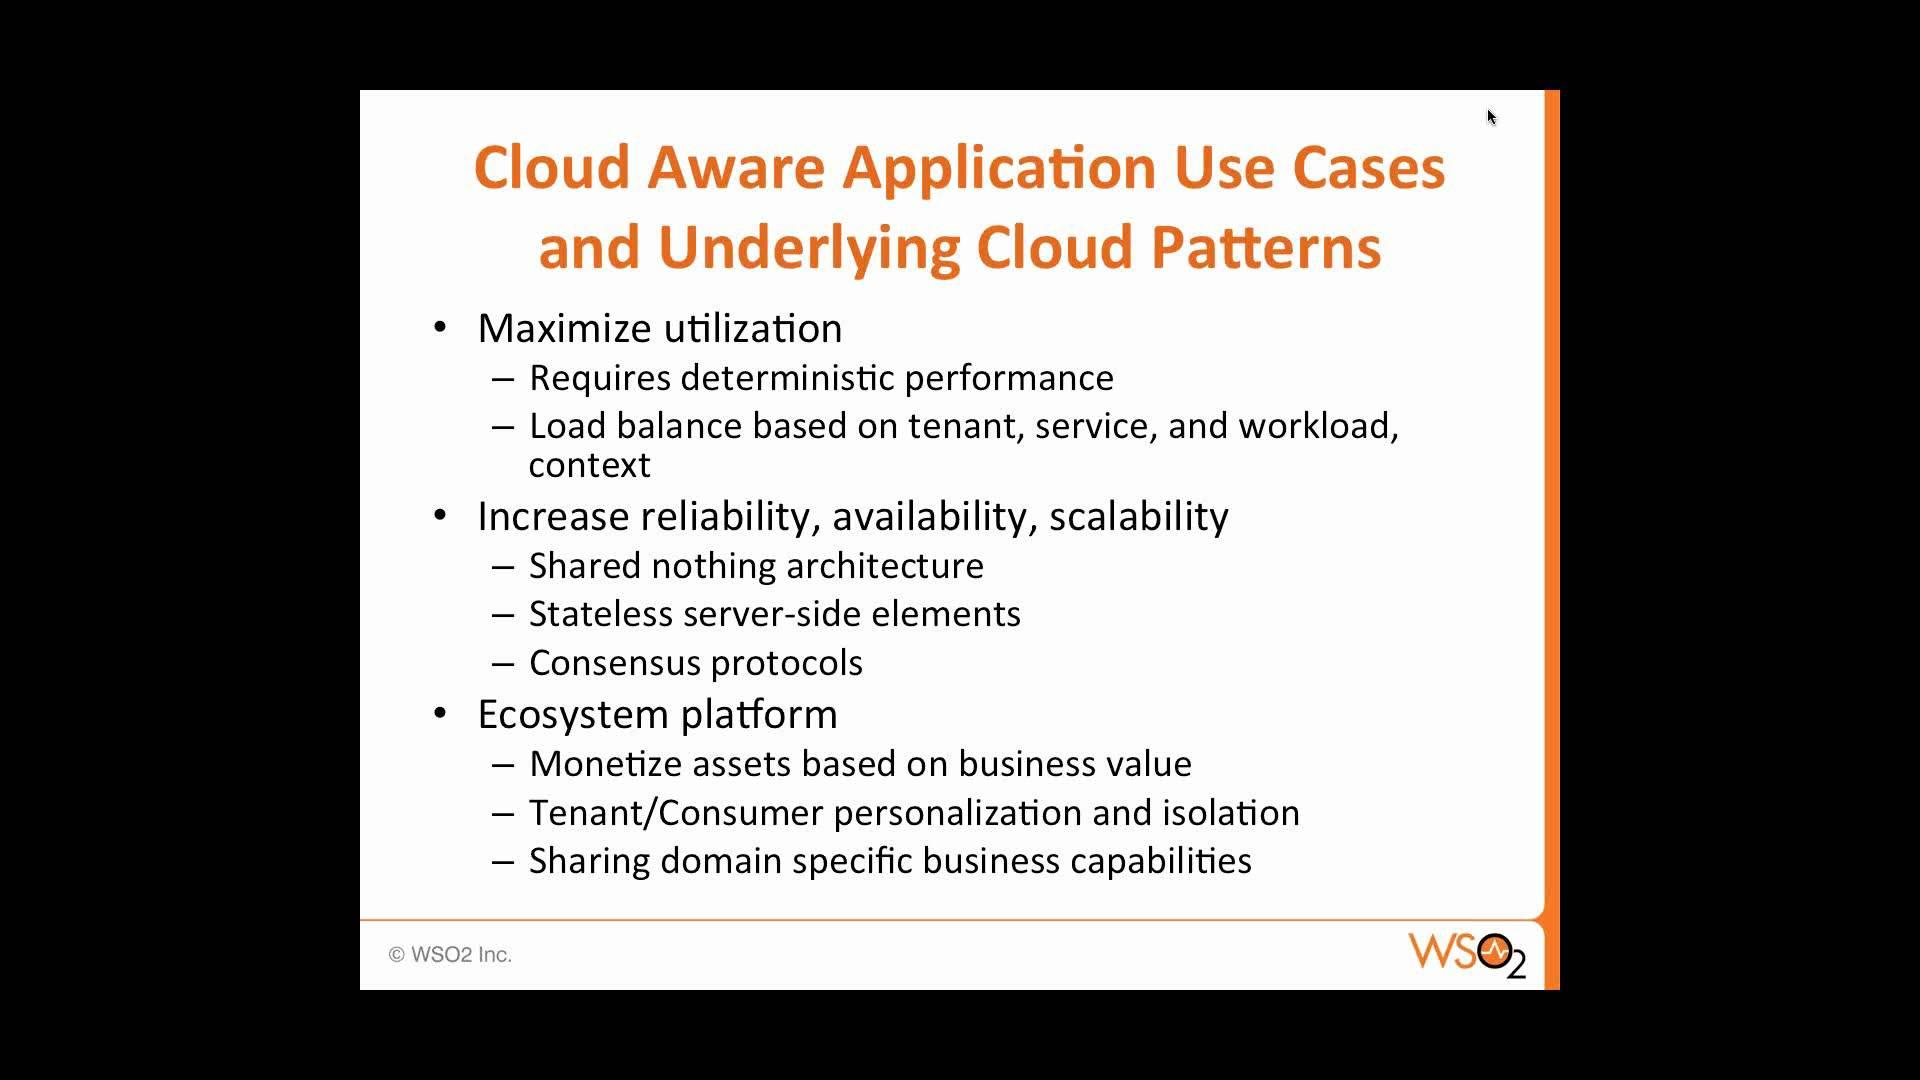 Building Cloud-Aware Applications